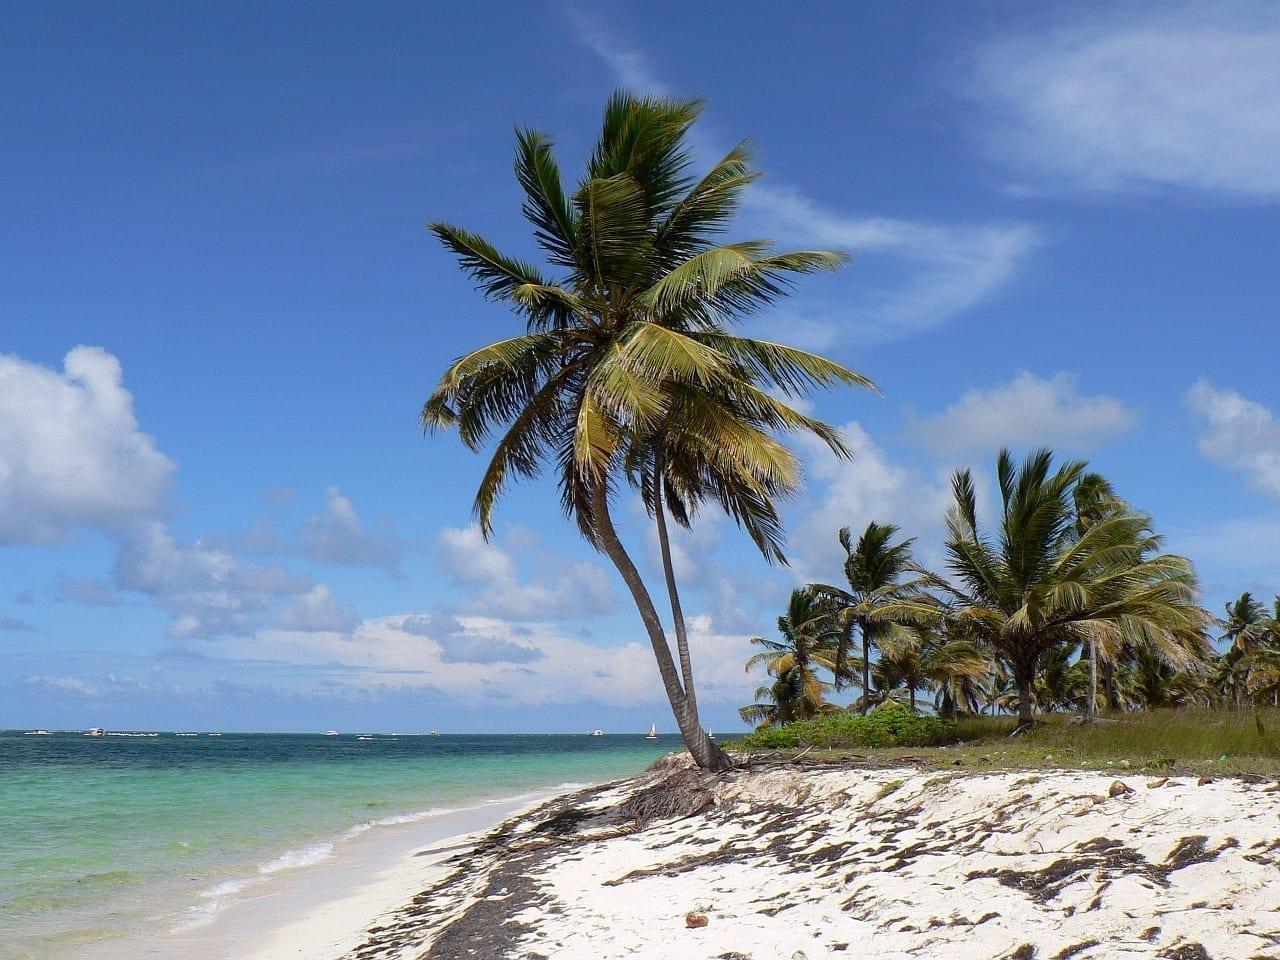 República Dominicana Punta Cana Playa